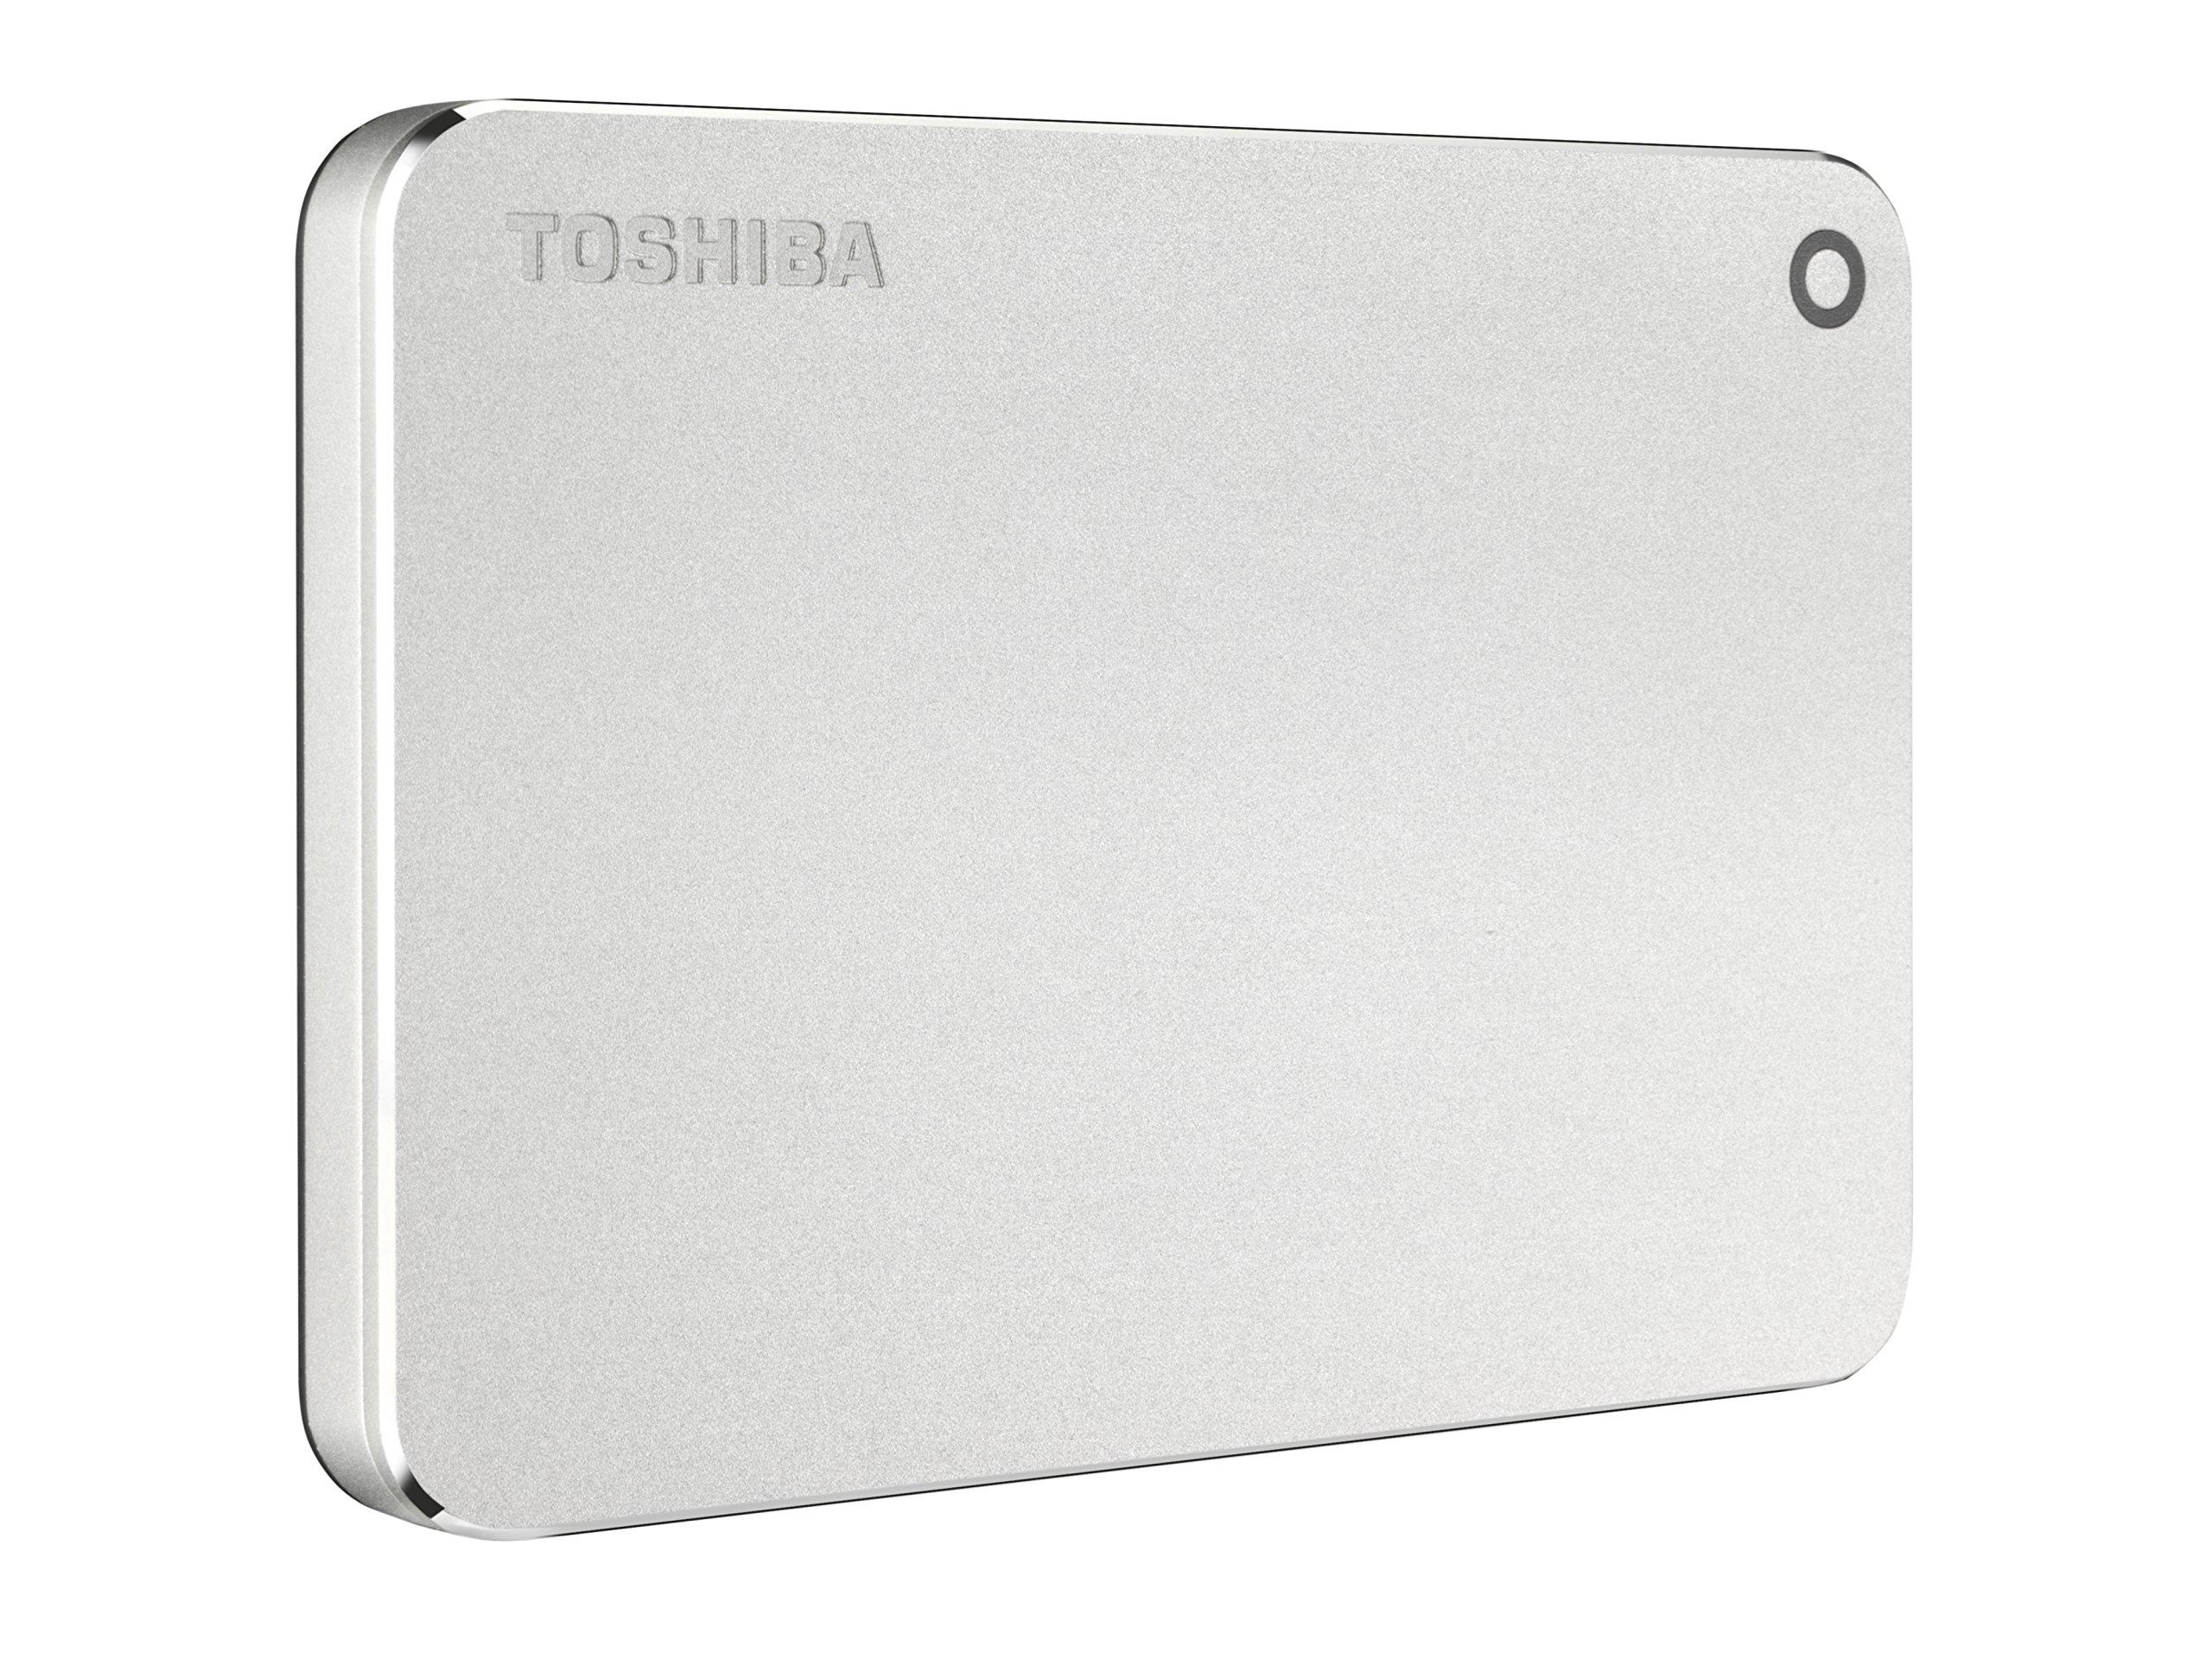 Toshiba Canvio Premium 2TB Portable External Hard Drive USB 3.0, Silver (HDTW220XS3AA)